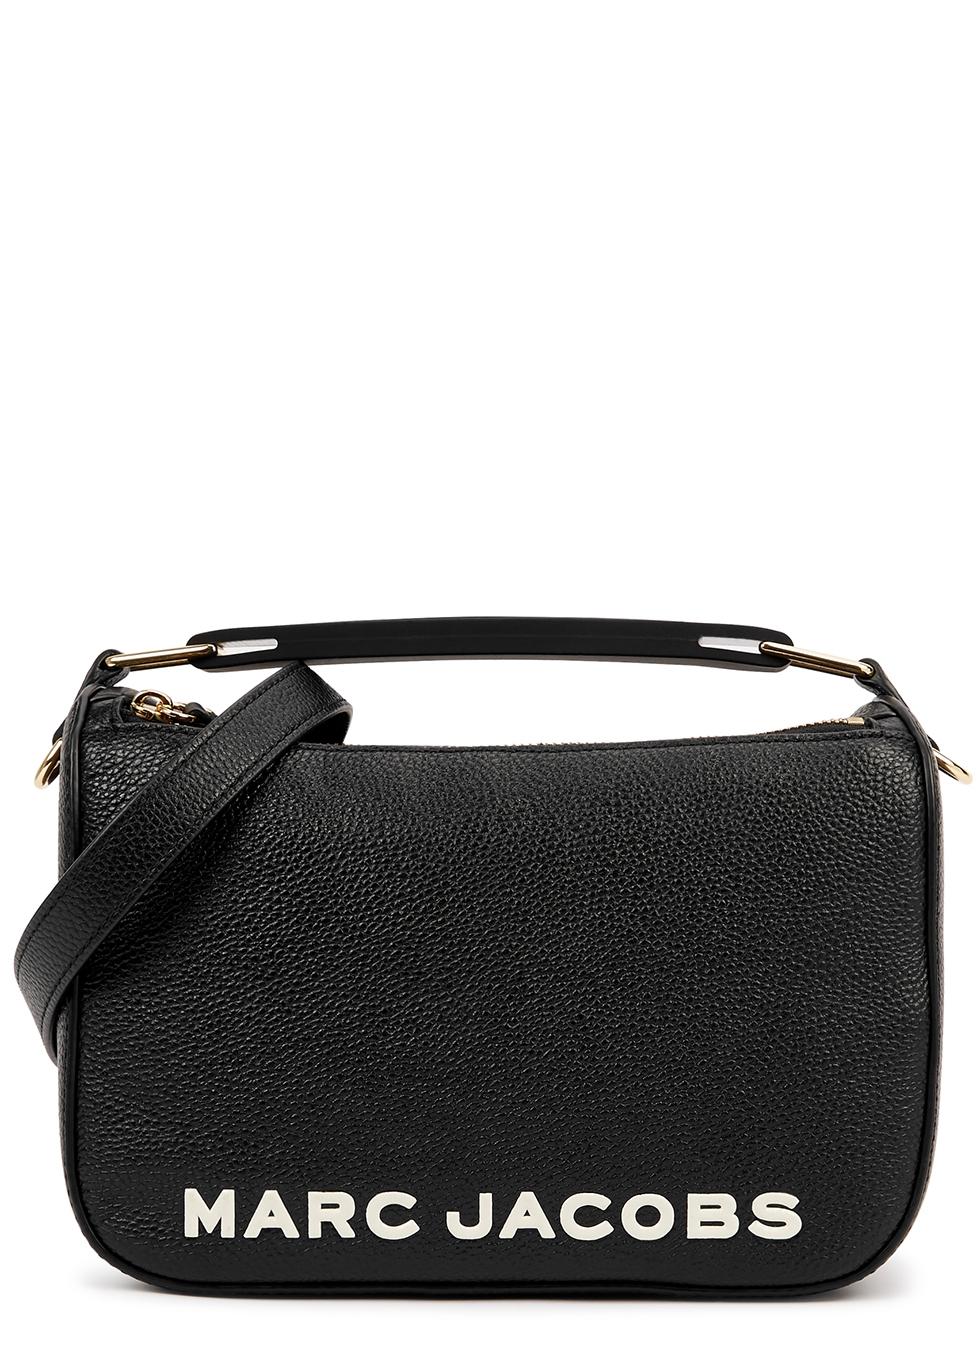 The Soft Box 23 black leather cross-body bag